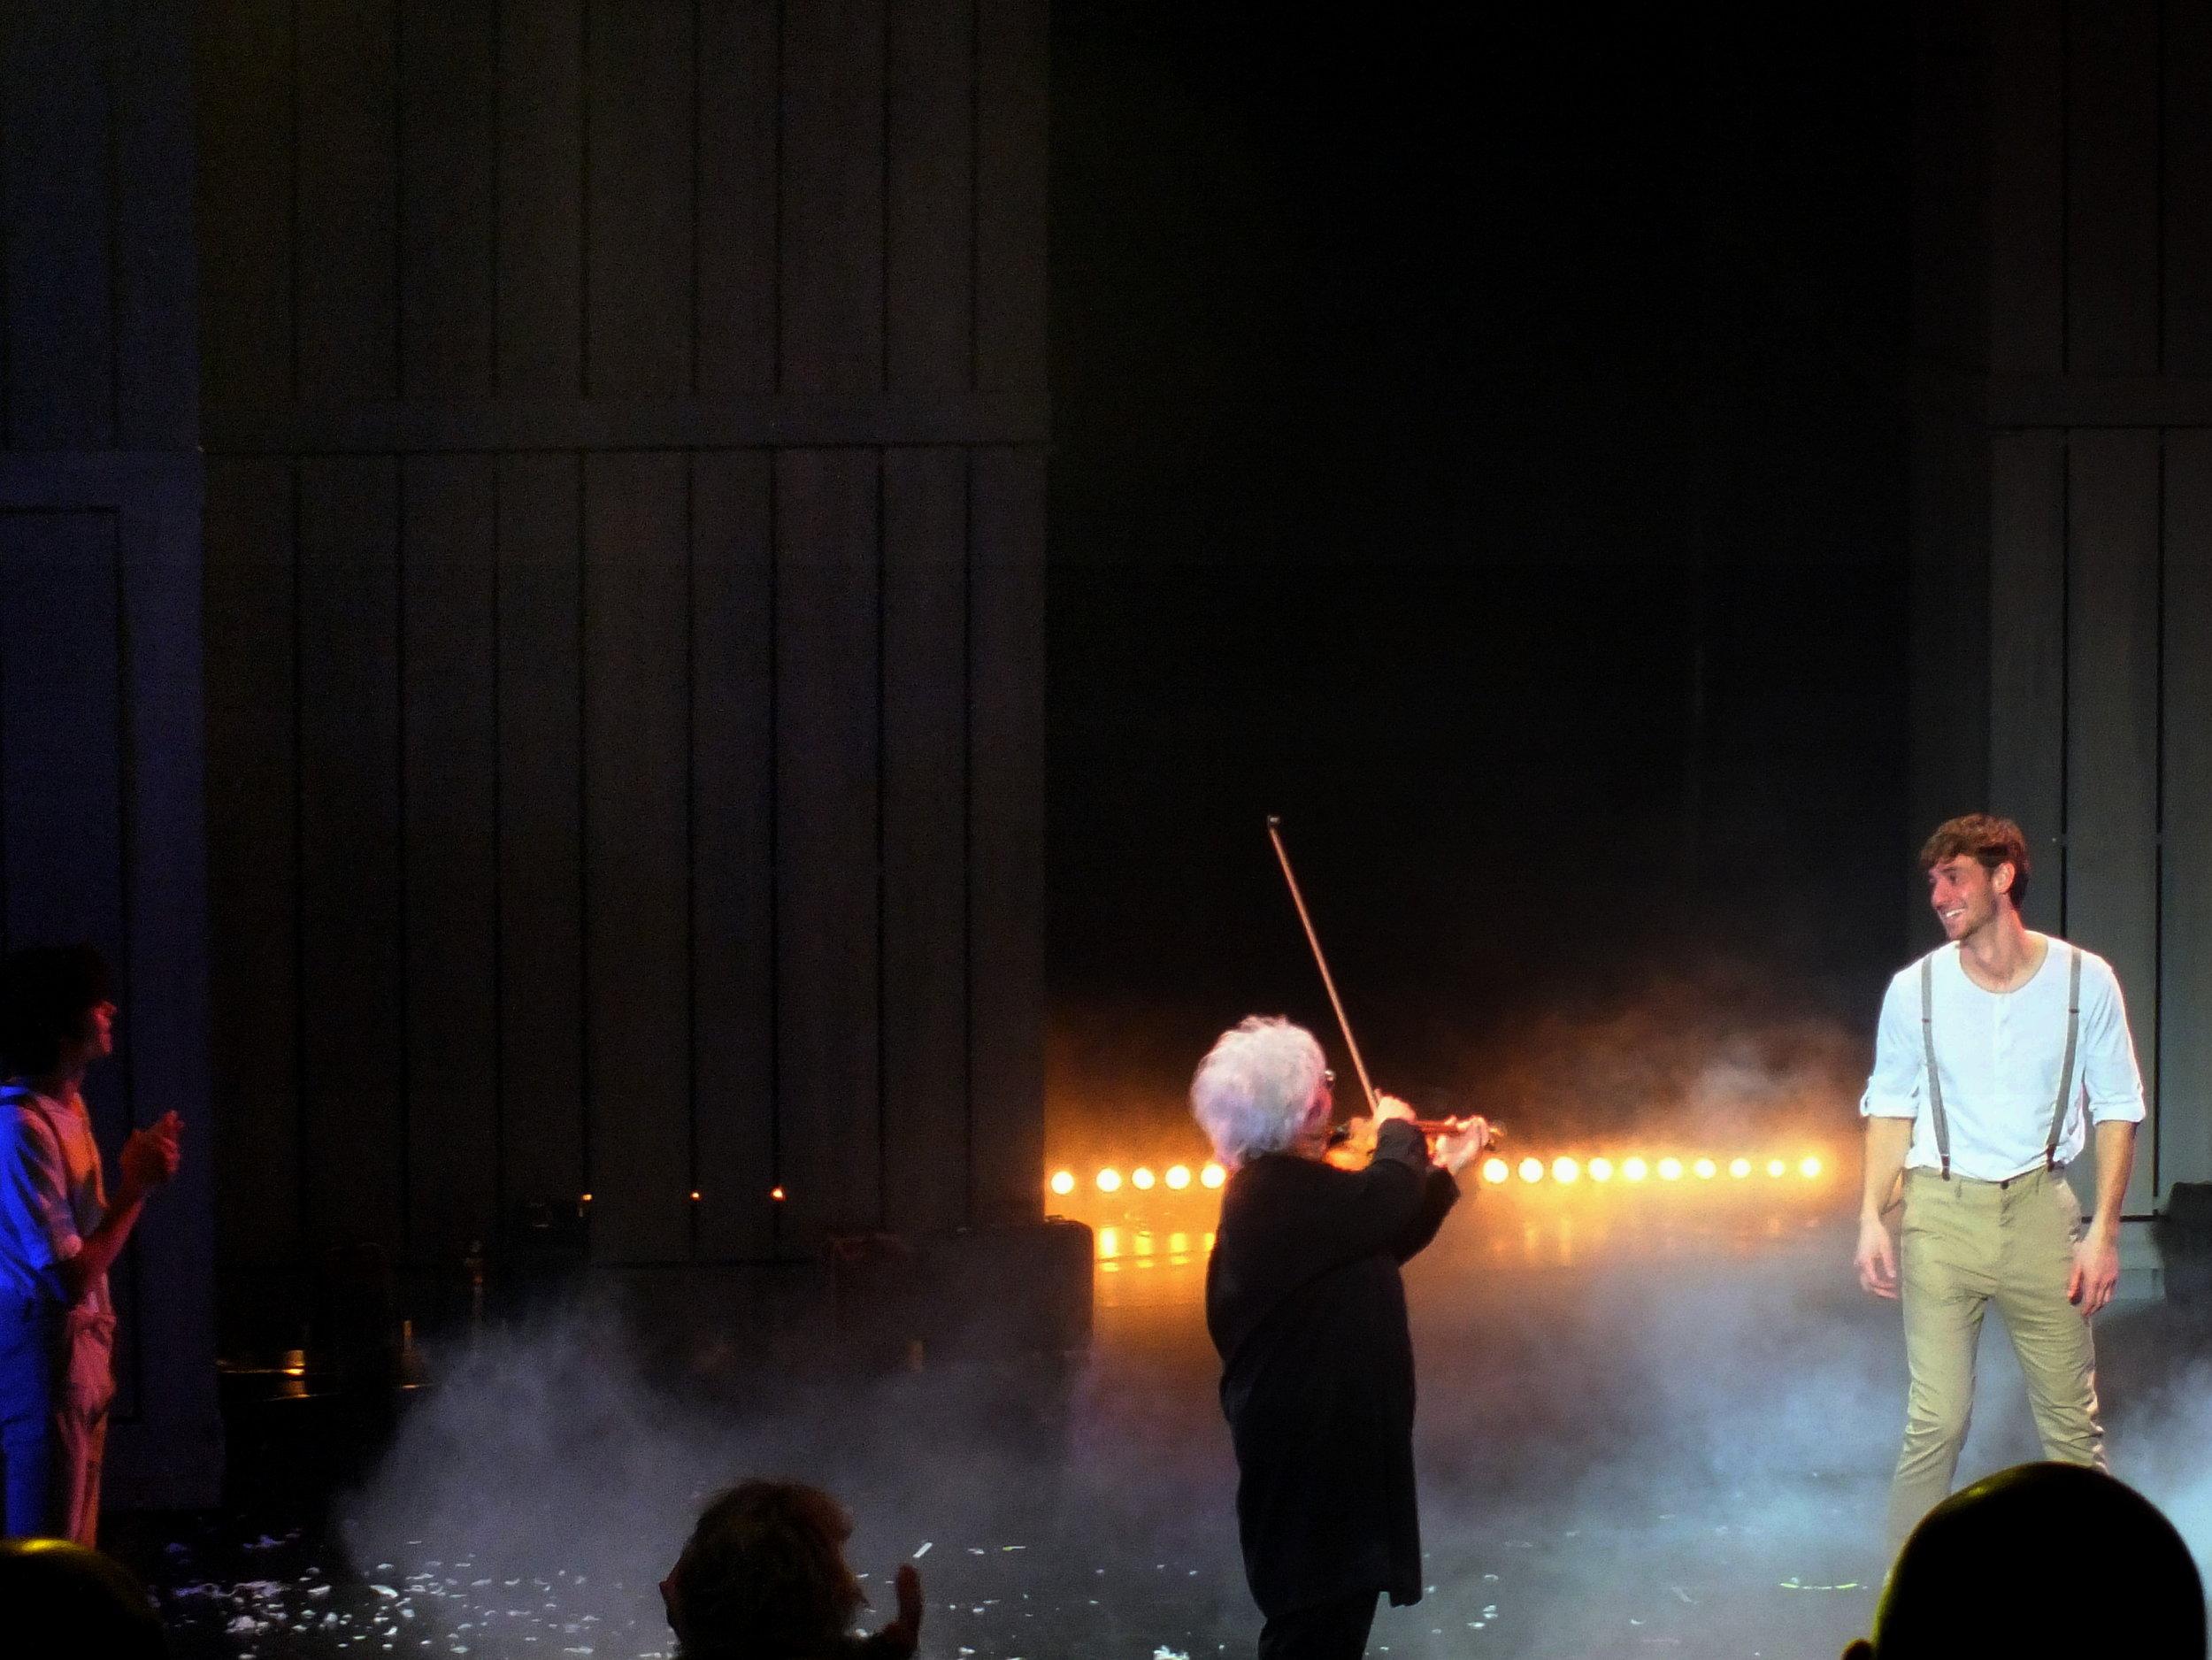 bô le vayage musical paris france theatre cathrine lara highline trickline show funambule circus performance spectacle ecole suisse Slackline Lyell Grunberg  (2).JPG